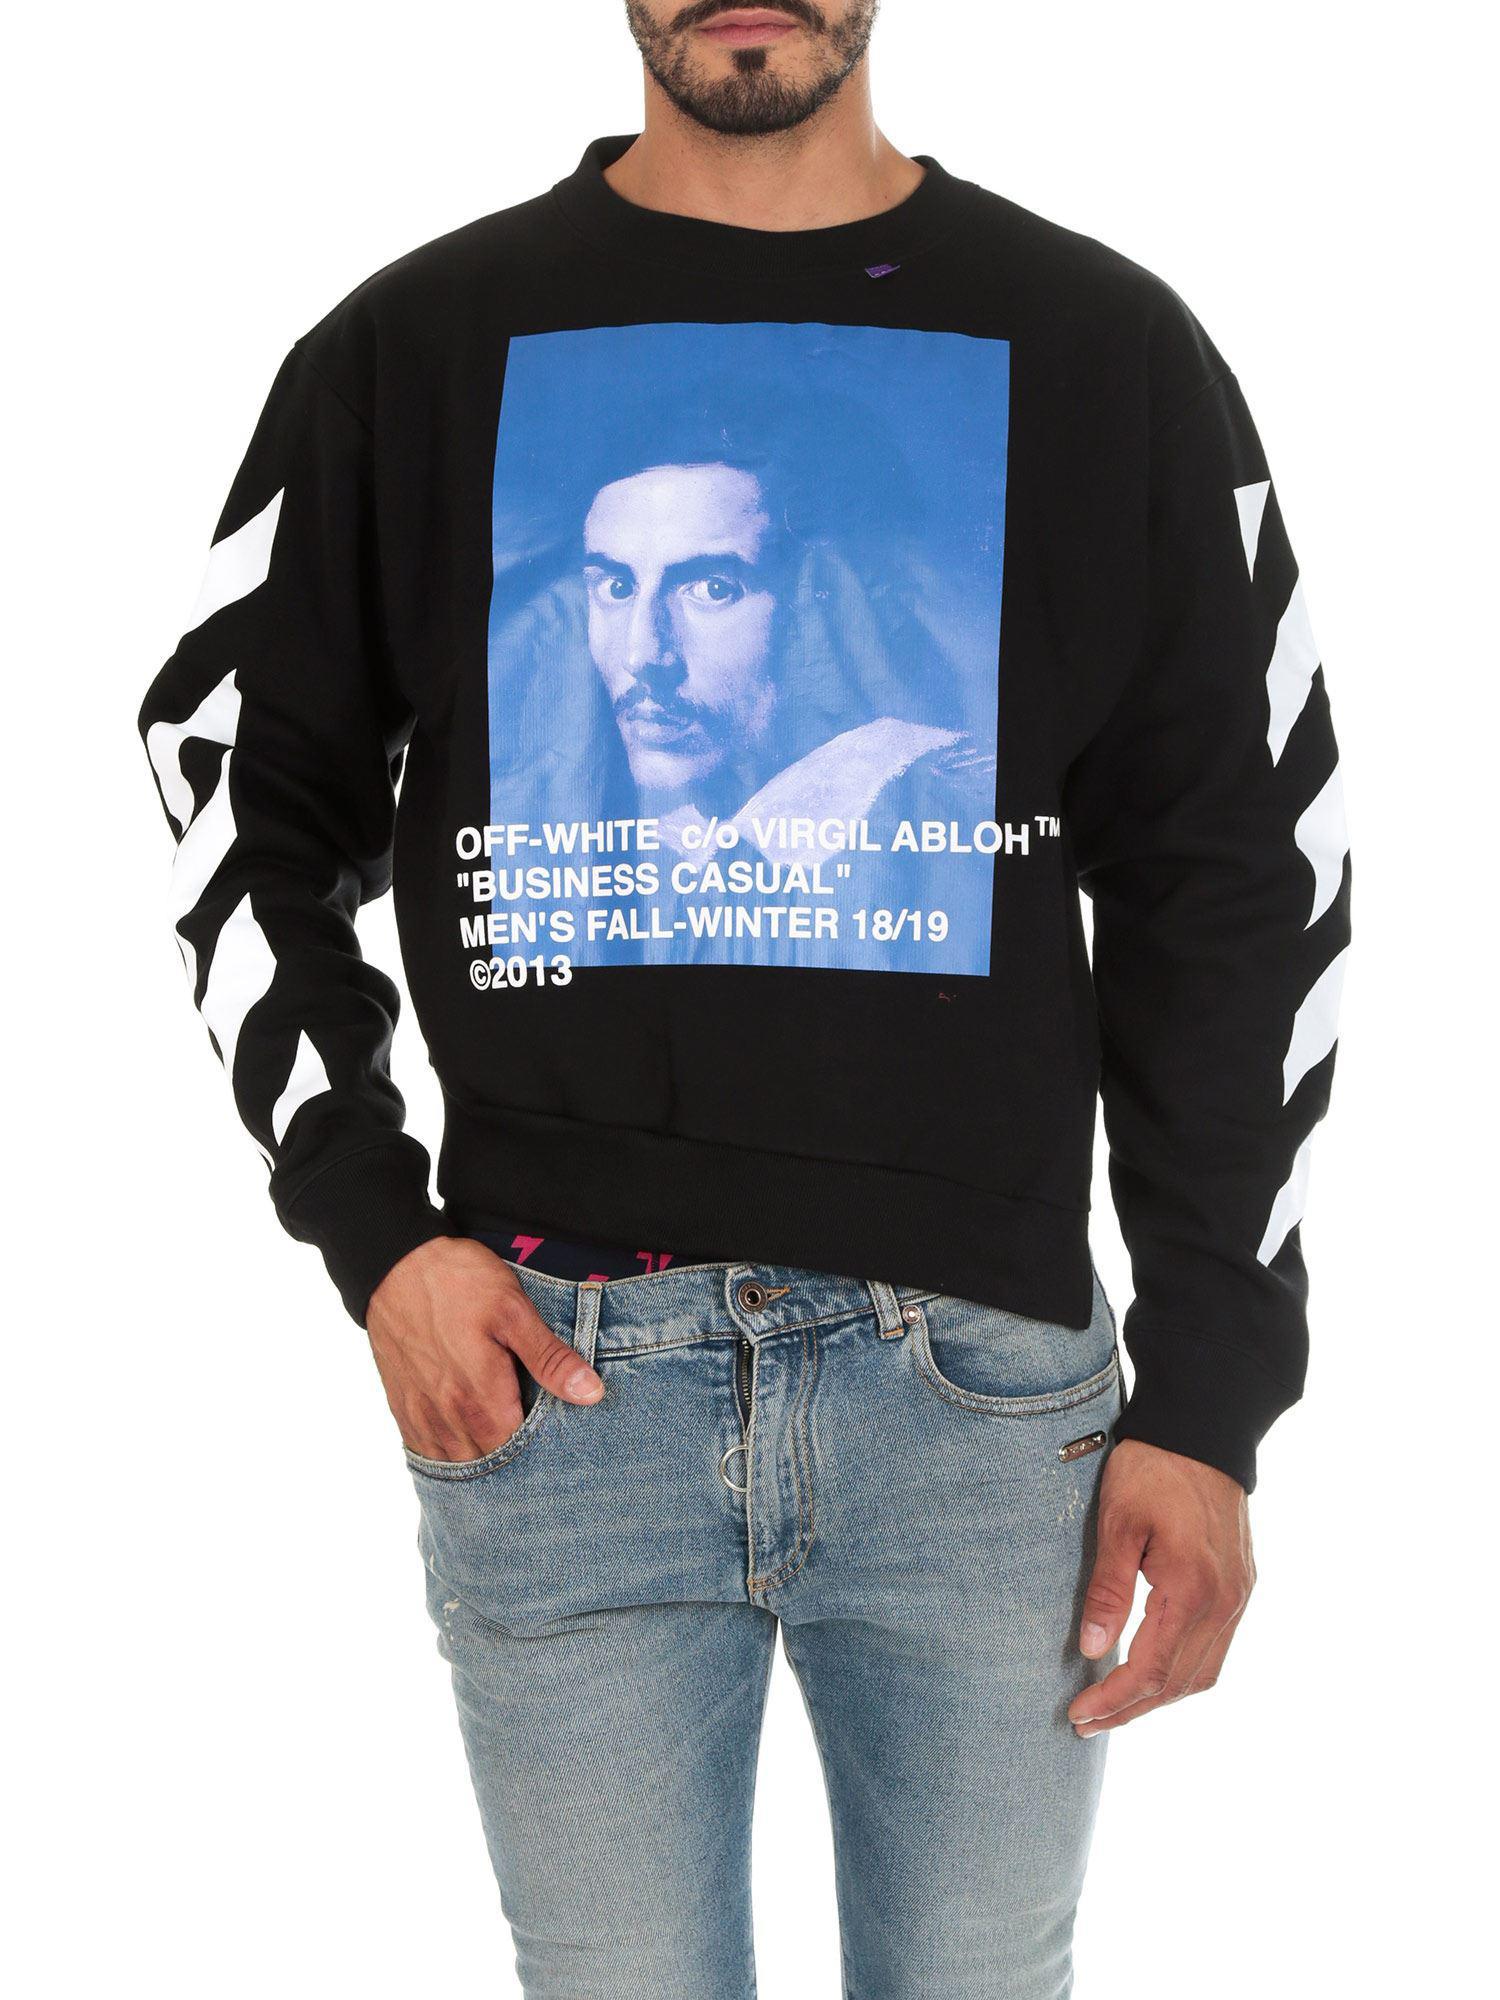 aee1bca7 Off-White c/o Virgil Abloh Diag Bernini Black Asymmetric Sweatshirt ...